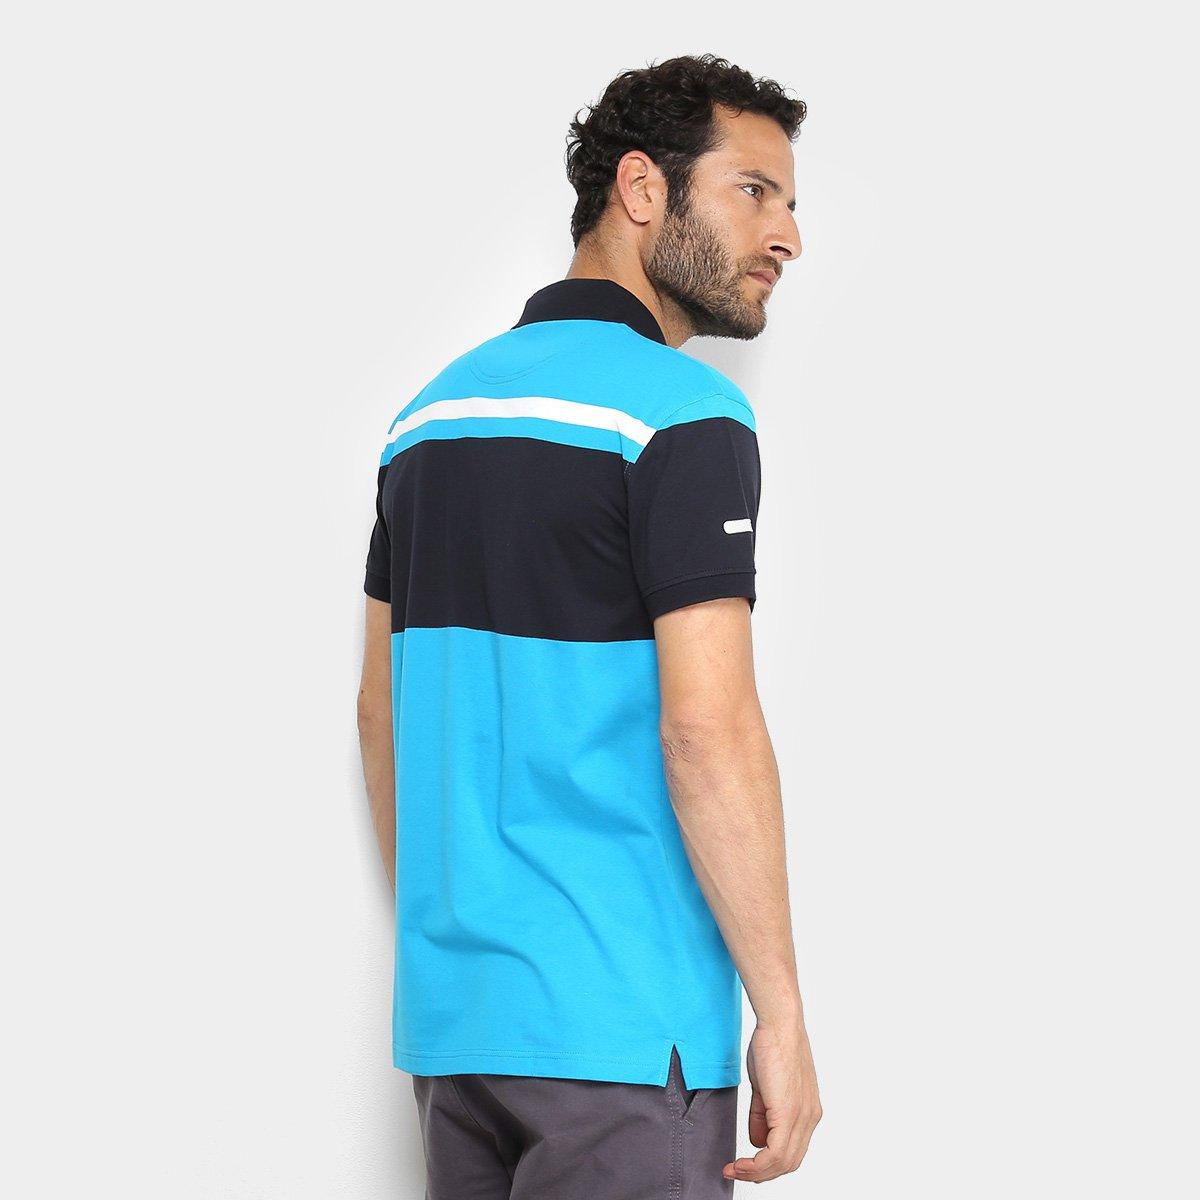 Camisa Polo Aleatory Listras Masculina  Camisa Polo Aleatory Listras  Masculina ... ea71a6938bf2d